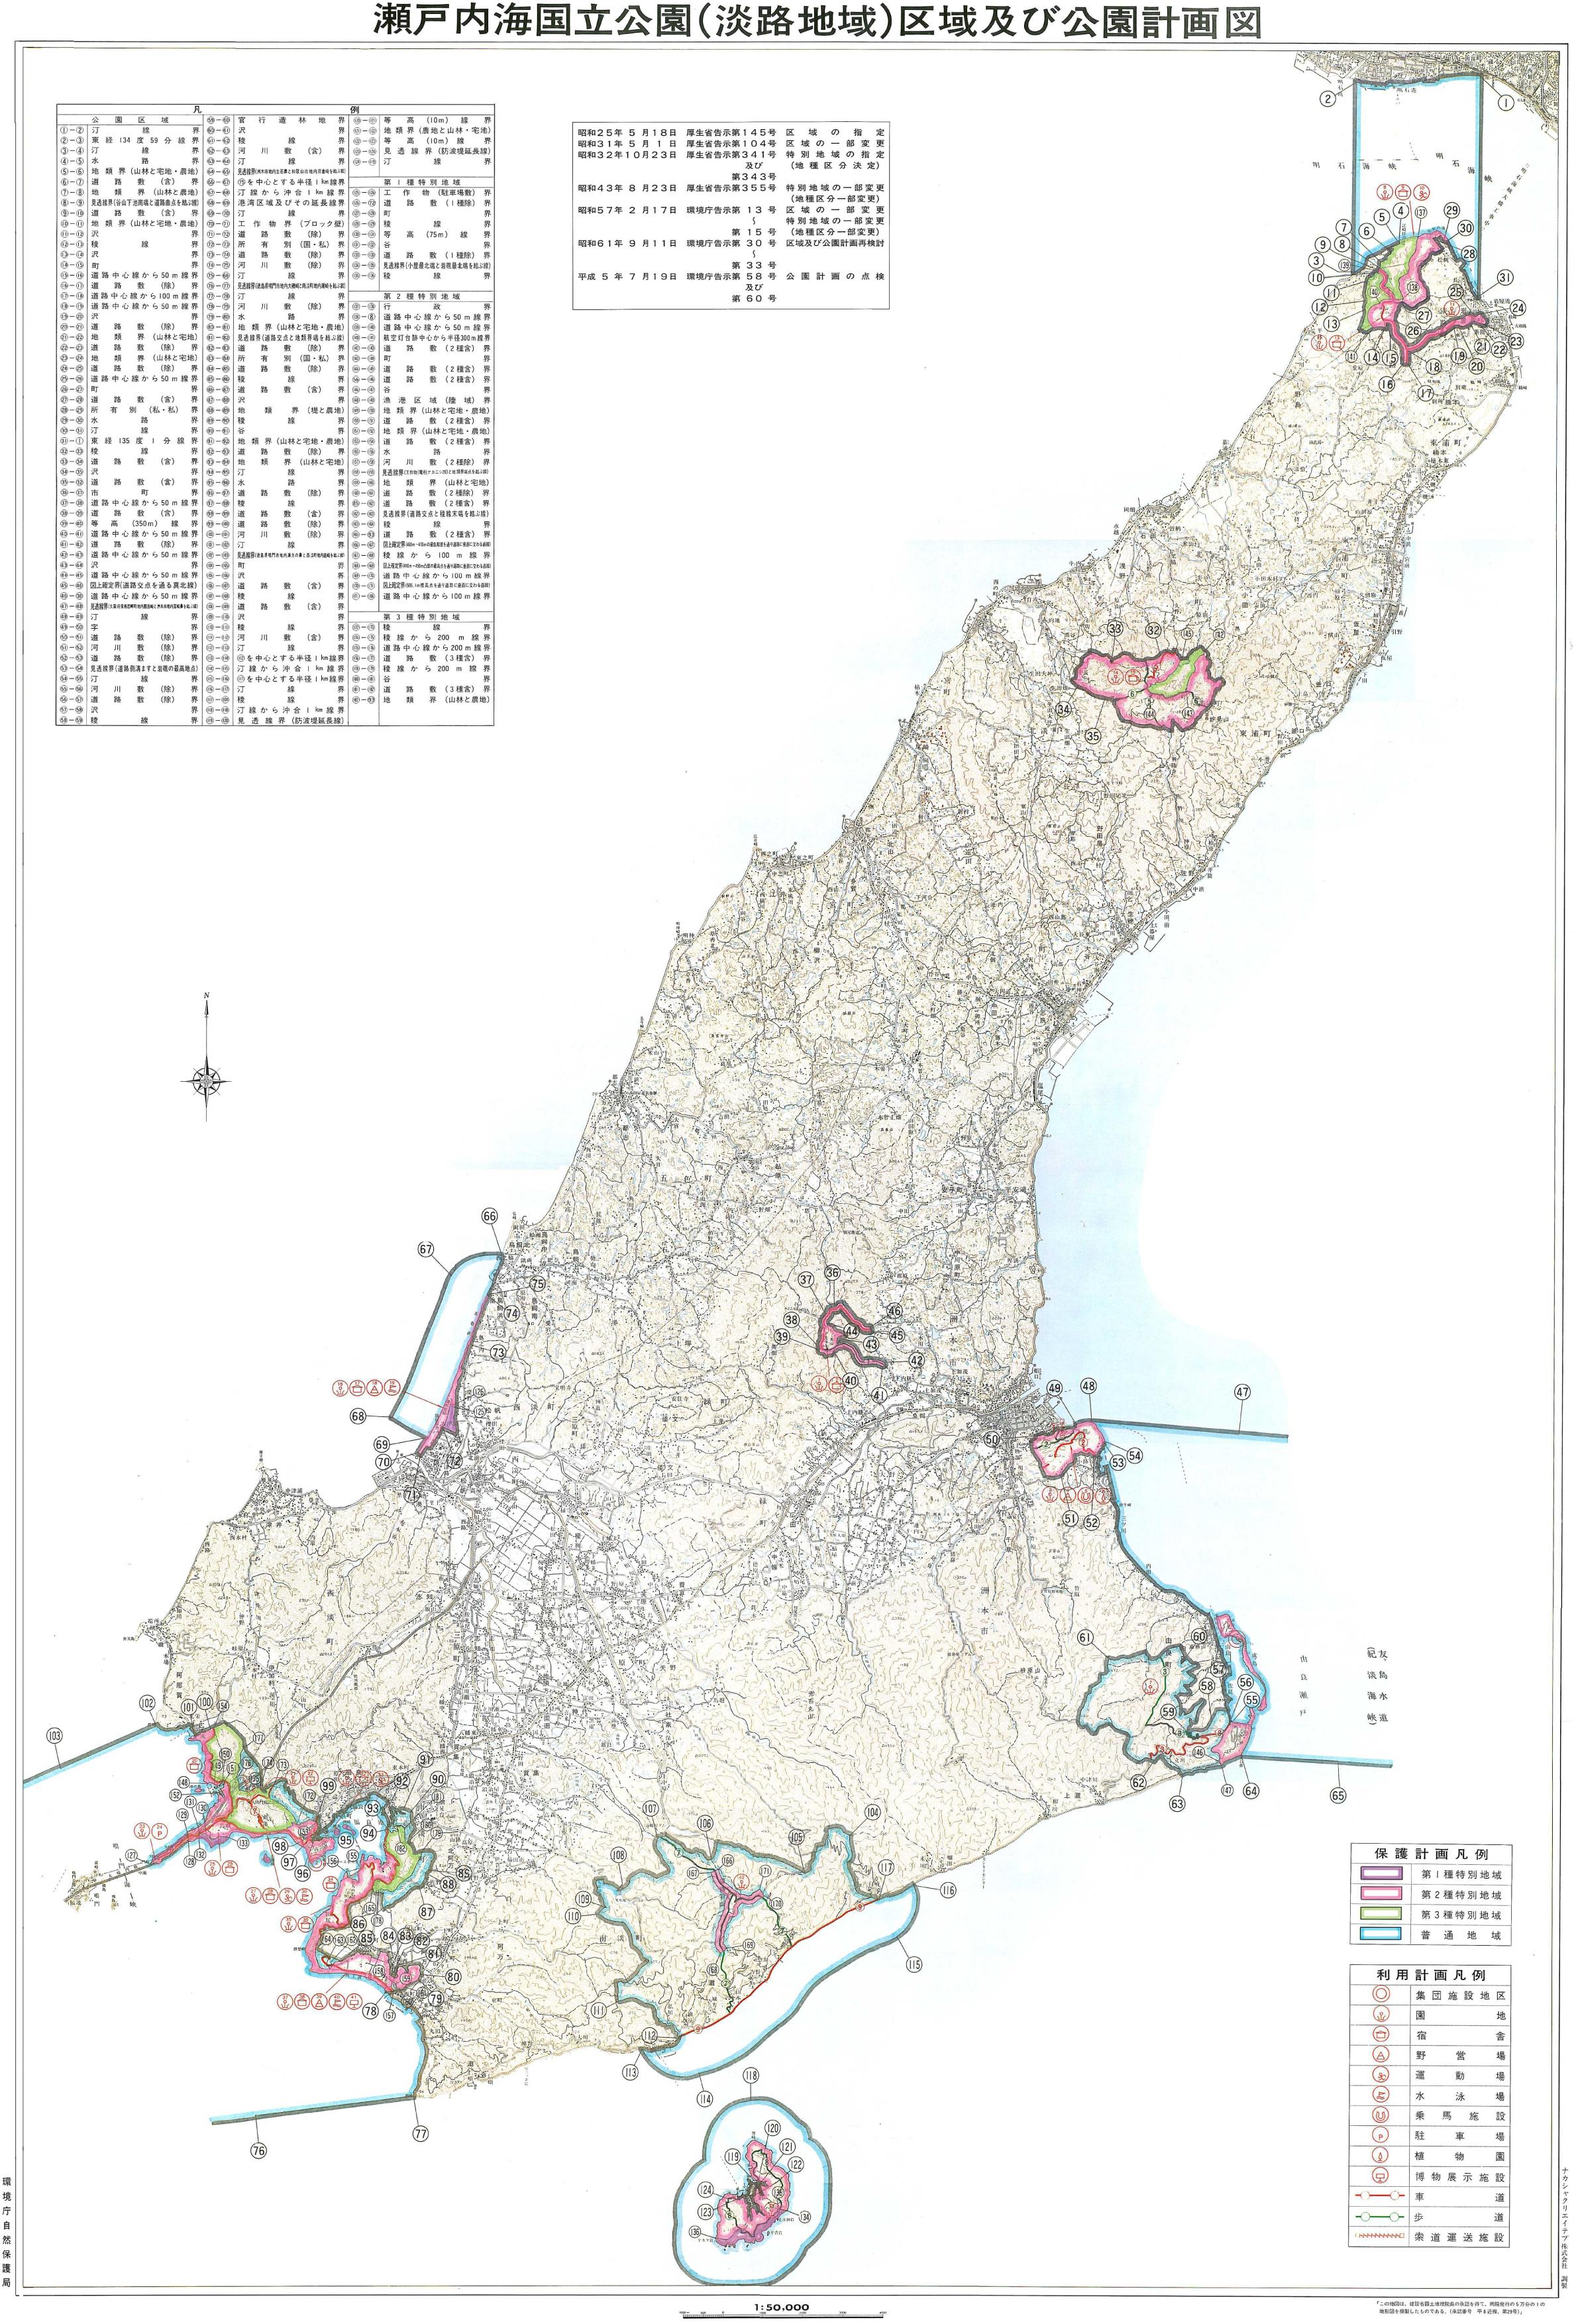 area_syousai_2